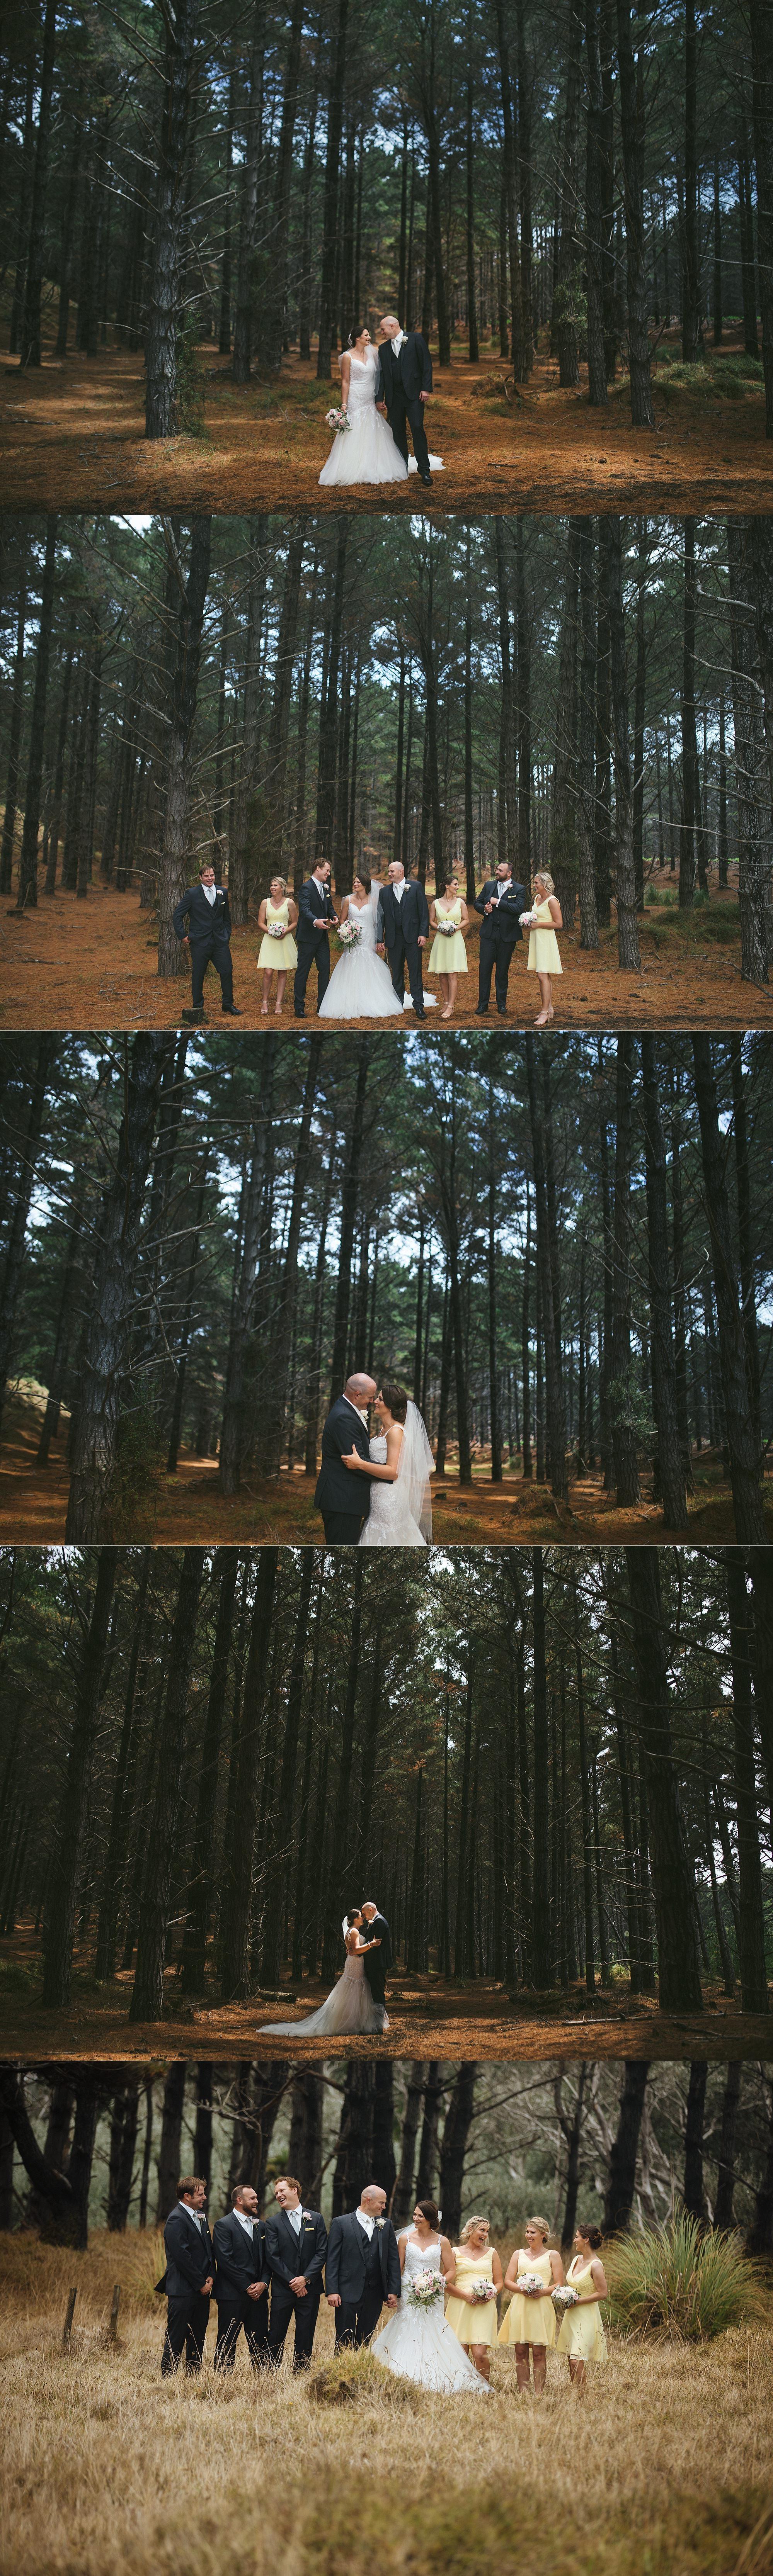 Kumeu Valley Estate wedding photos